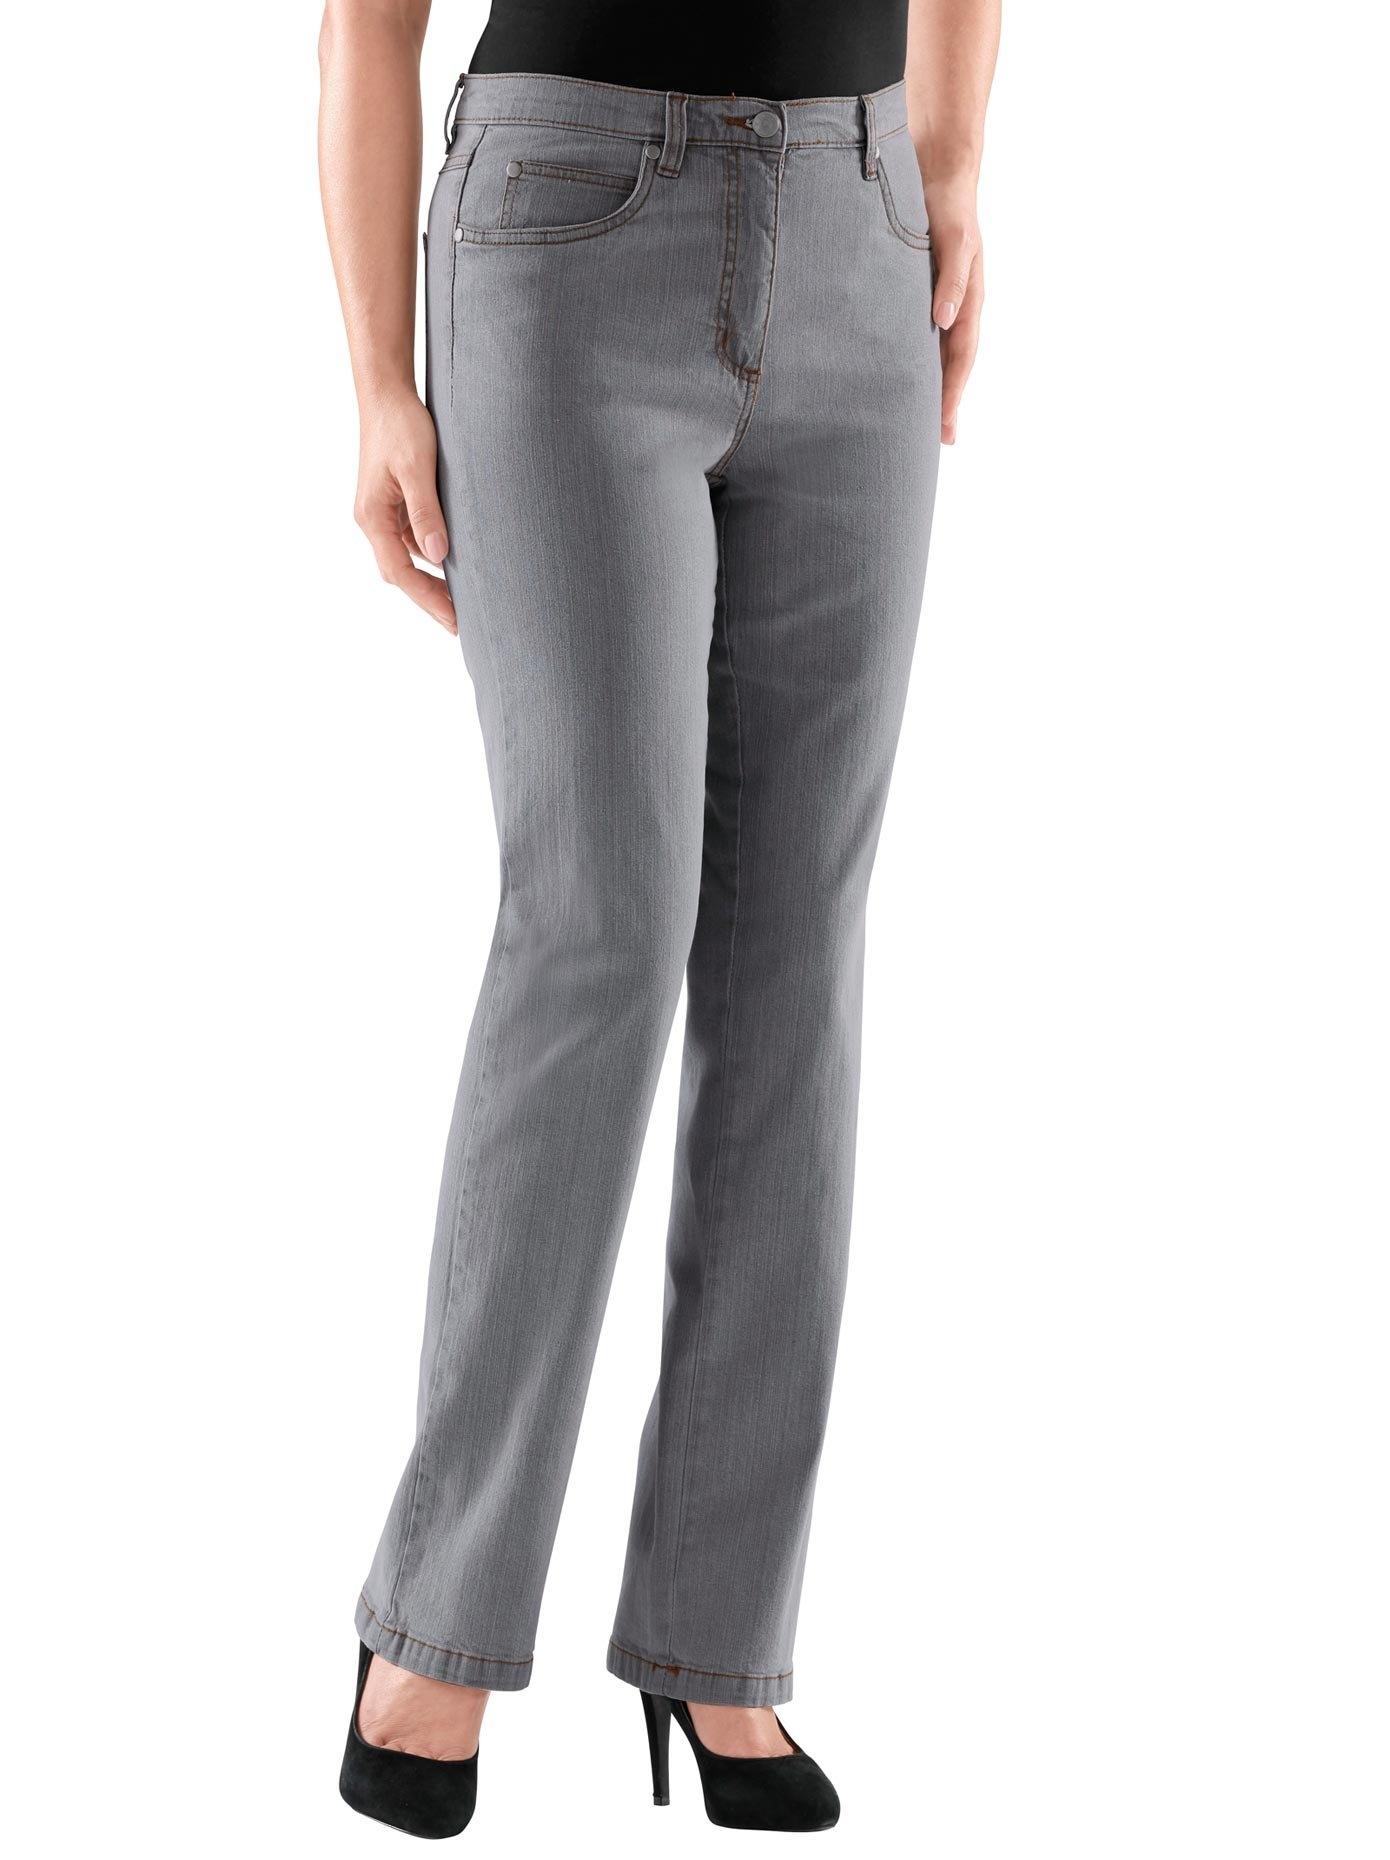 Casual Looks jeans in prettige stretchkwaliteit in de webshop van OTTO kopen